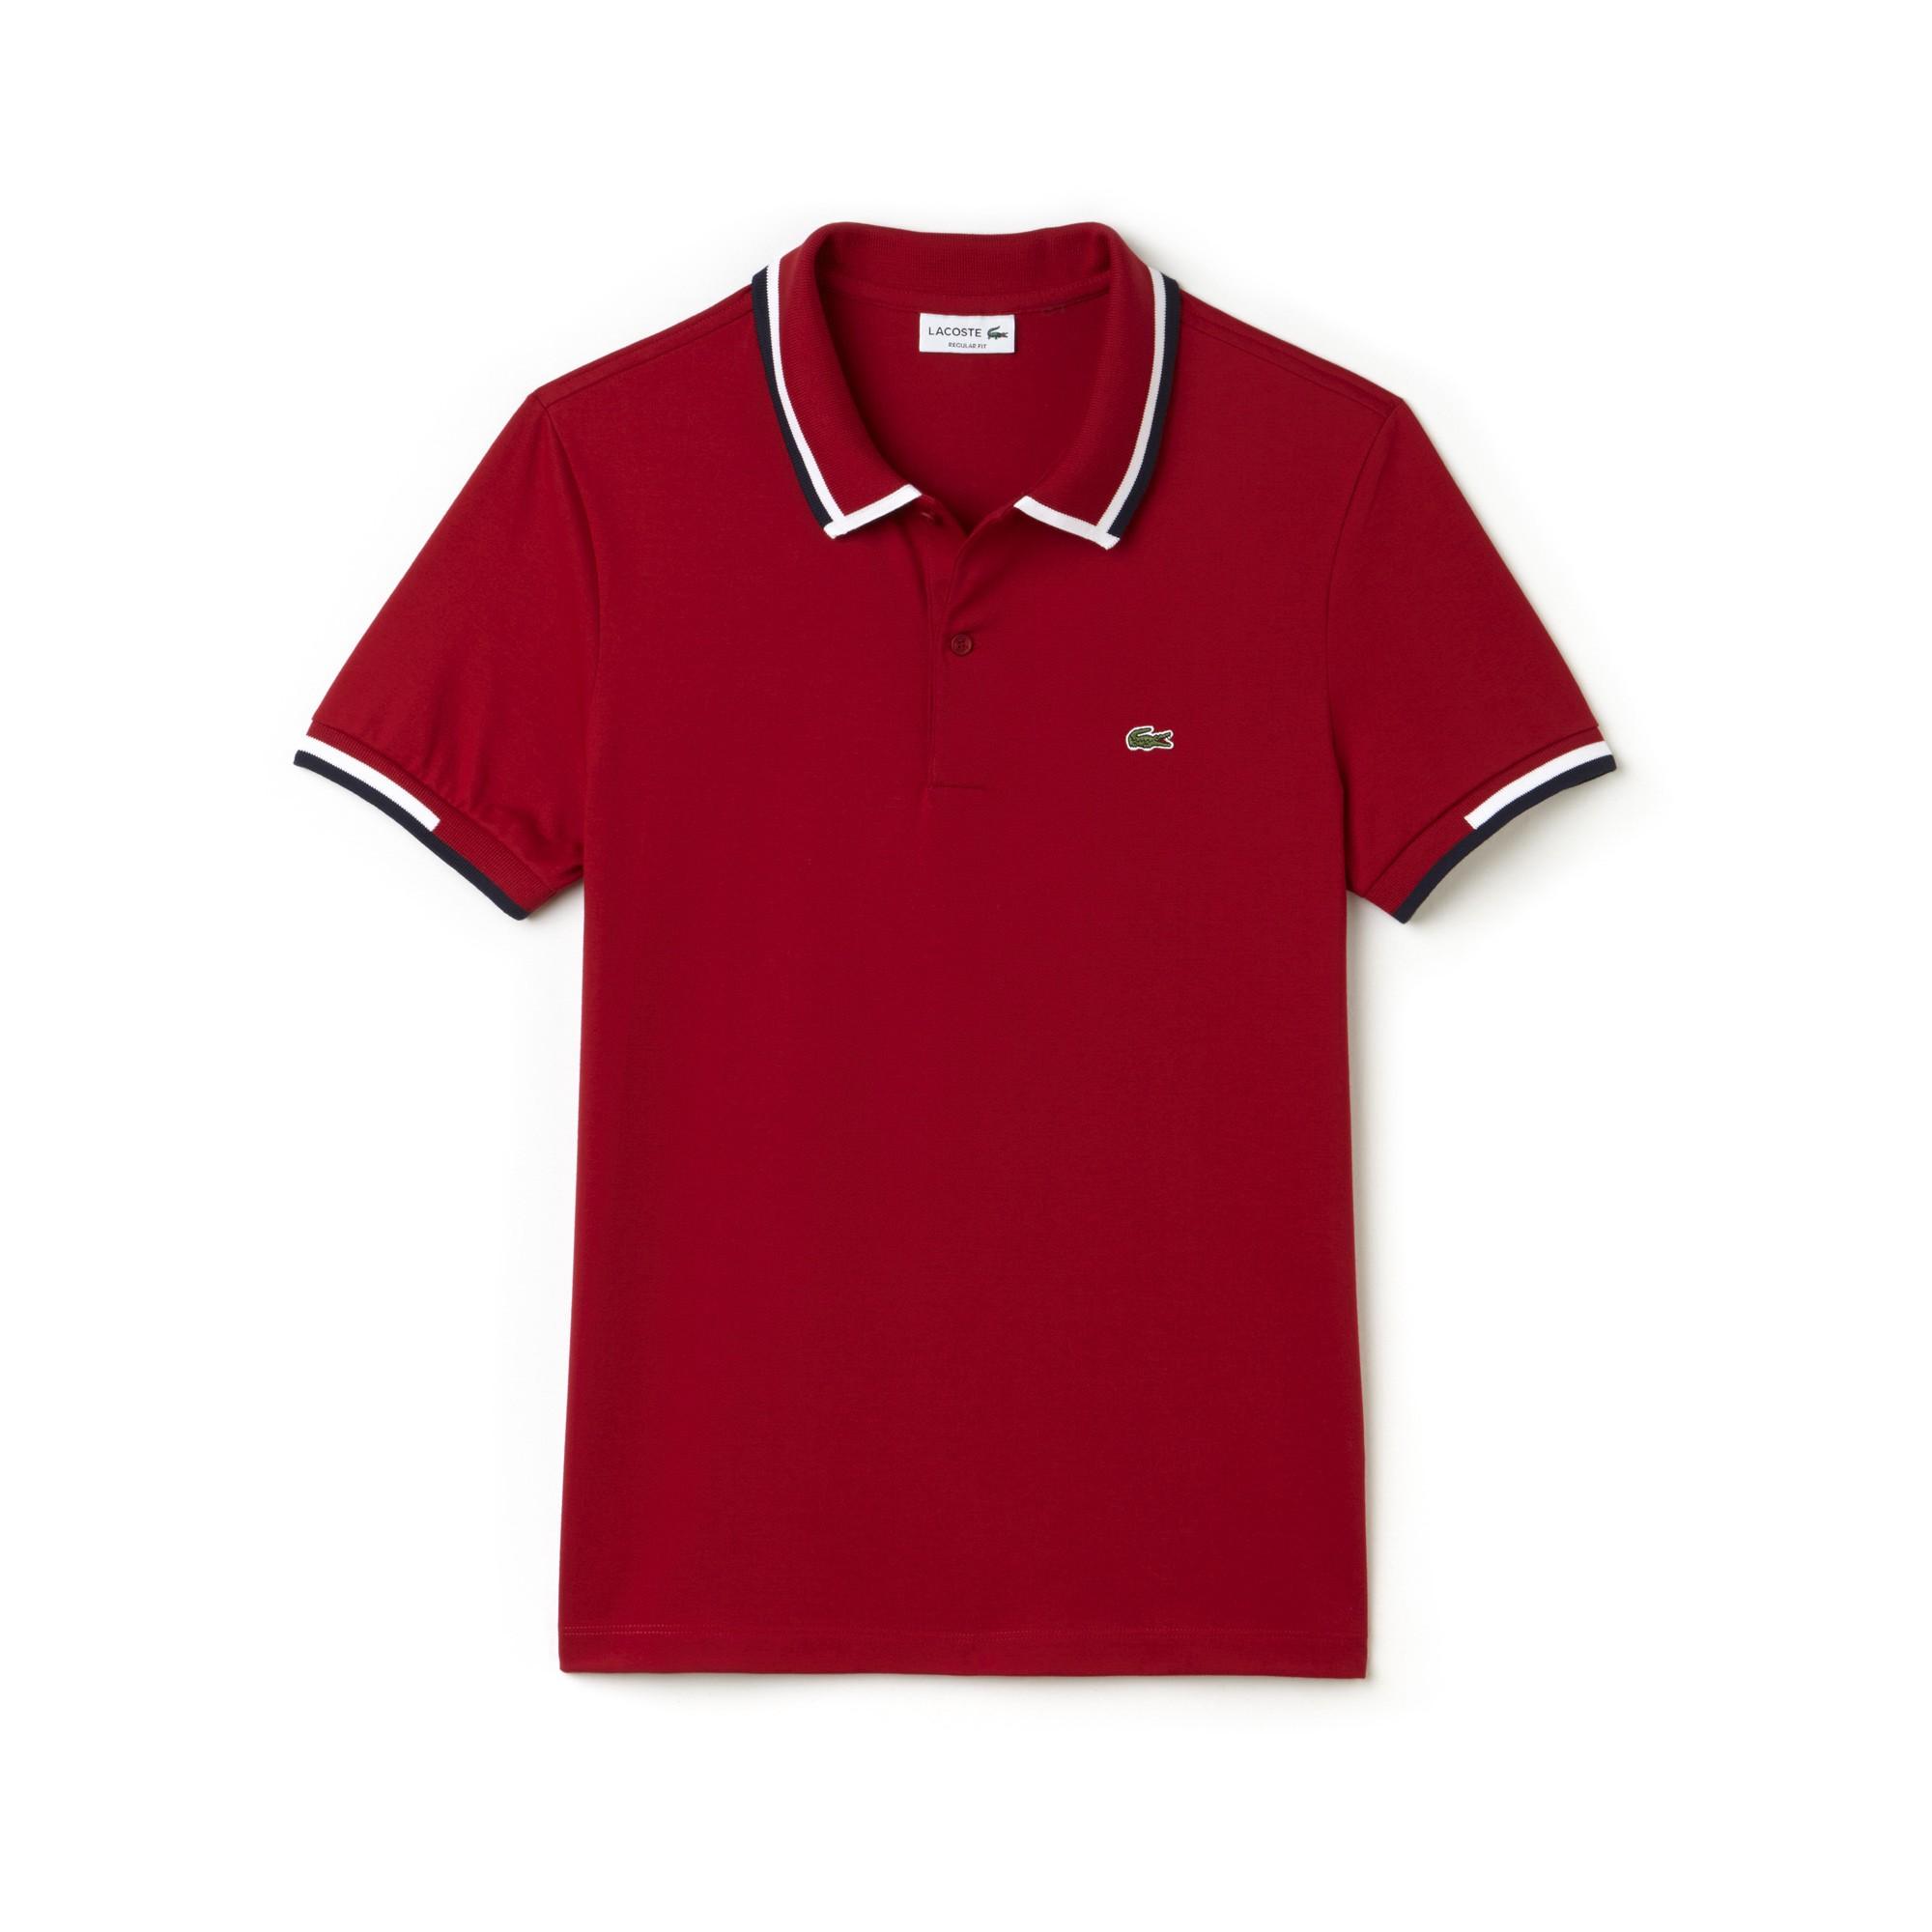 48c586d4 Lacoste Men's Regular Fit Tricolor Neck Jersey Polo - Ladybird/White ...